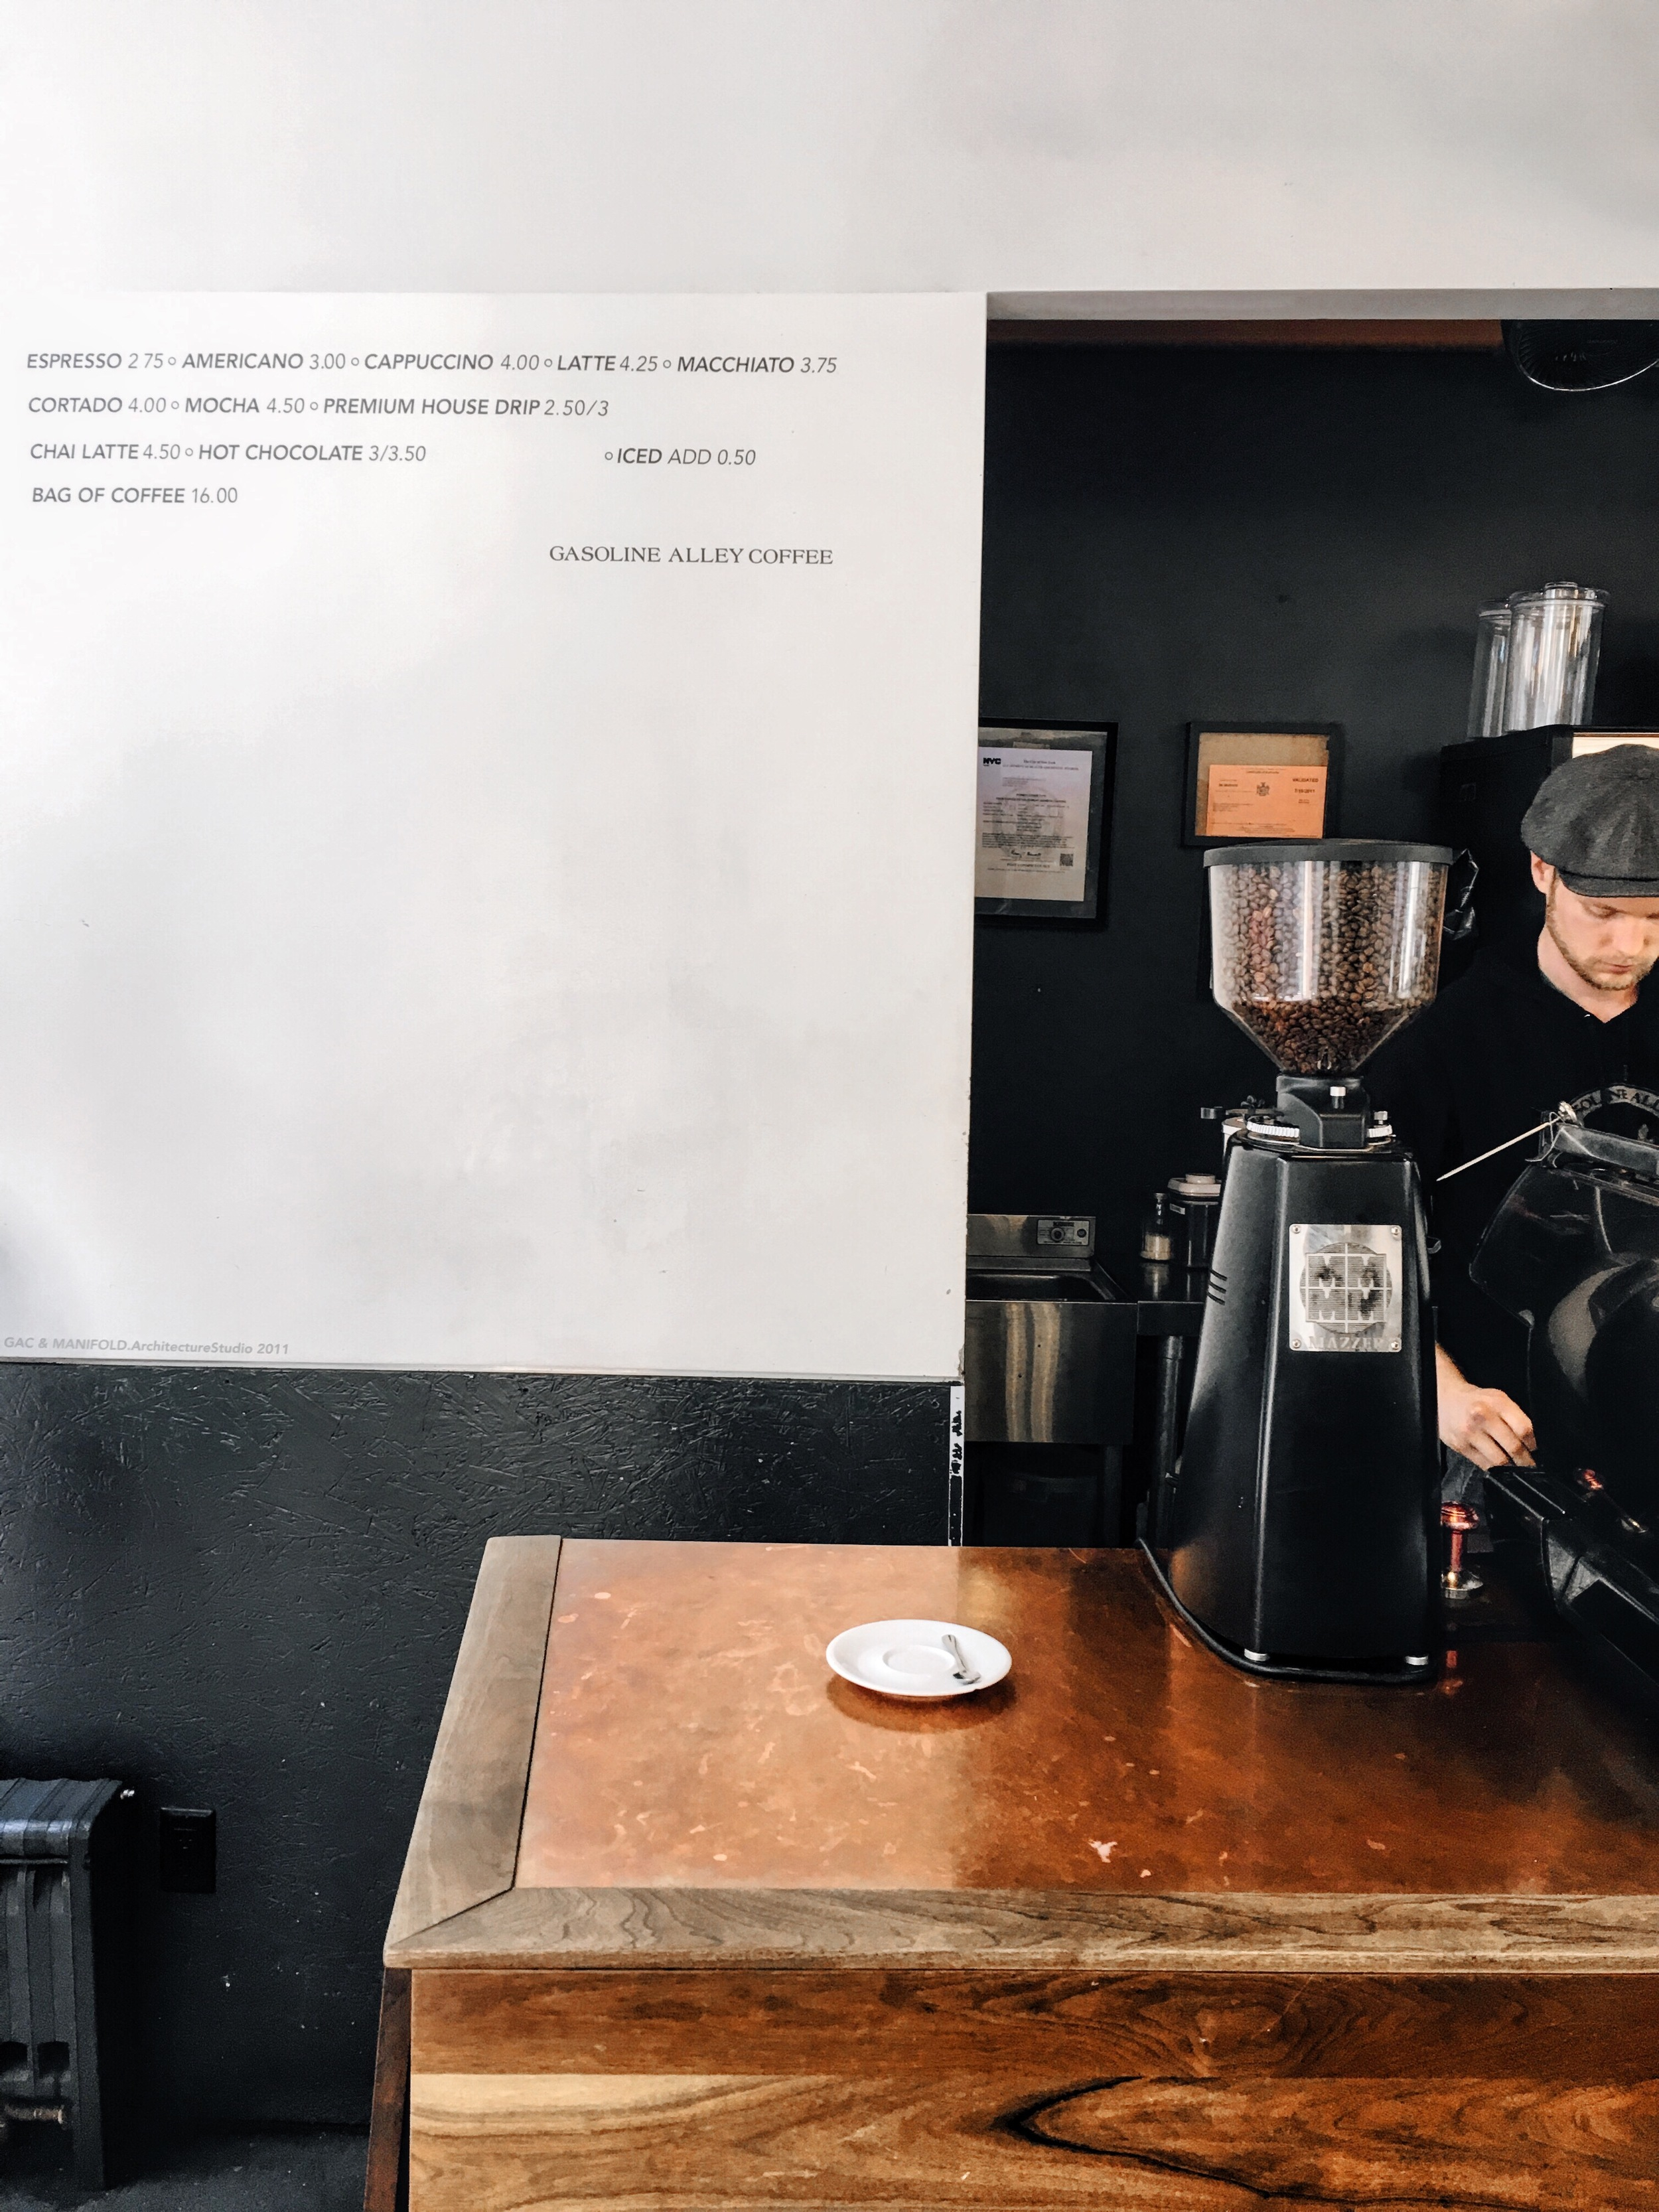 gasoline_alley_coffee_menu.jpg